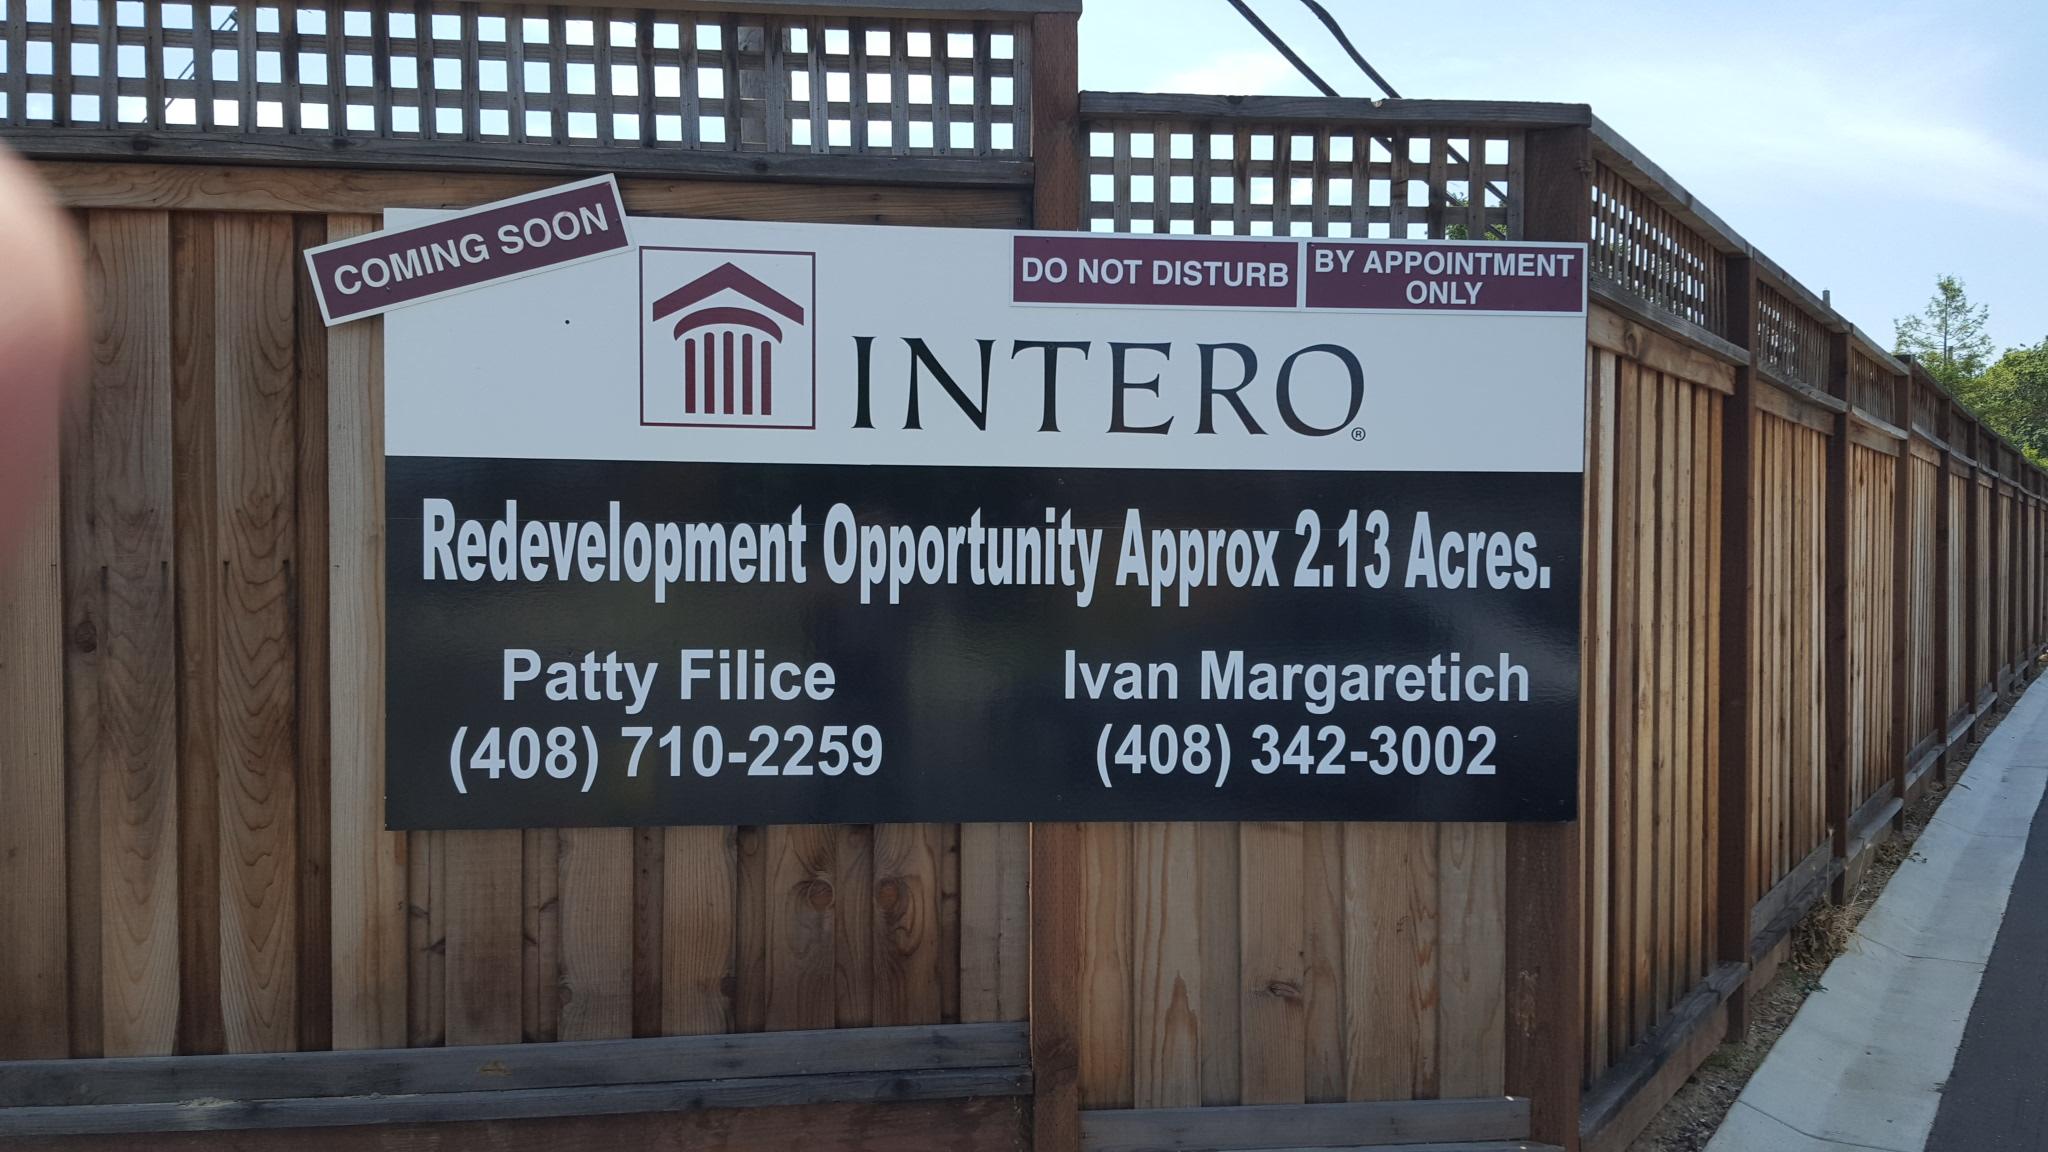 Intero Real Estate For Sale Sign